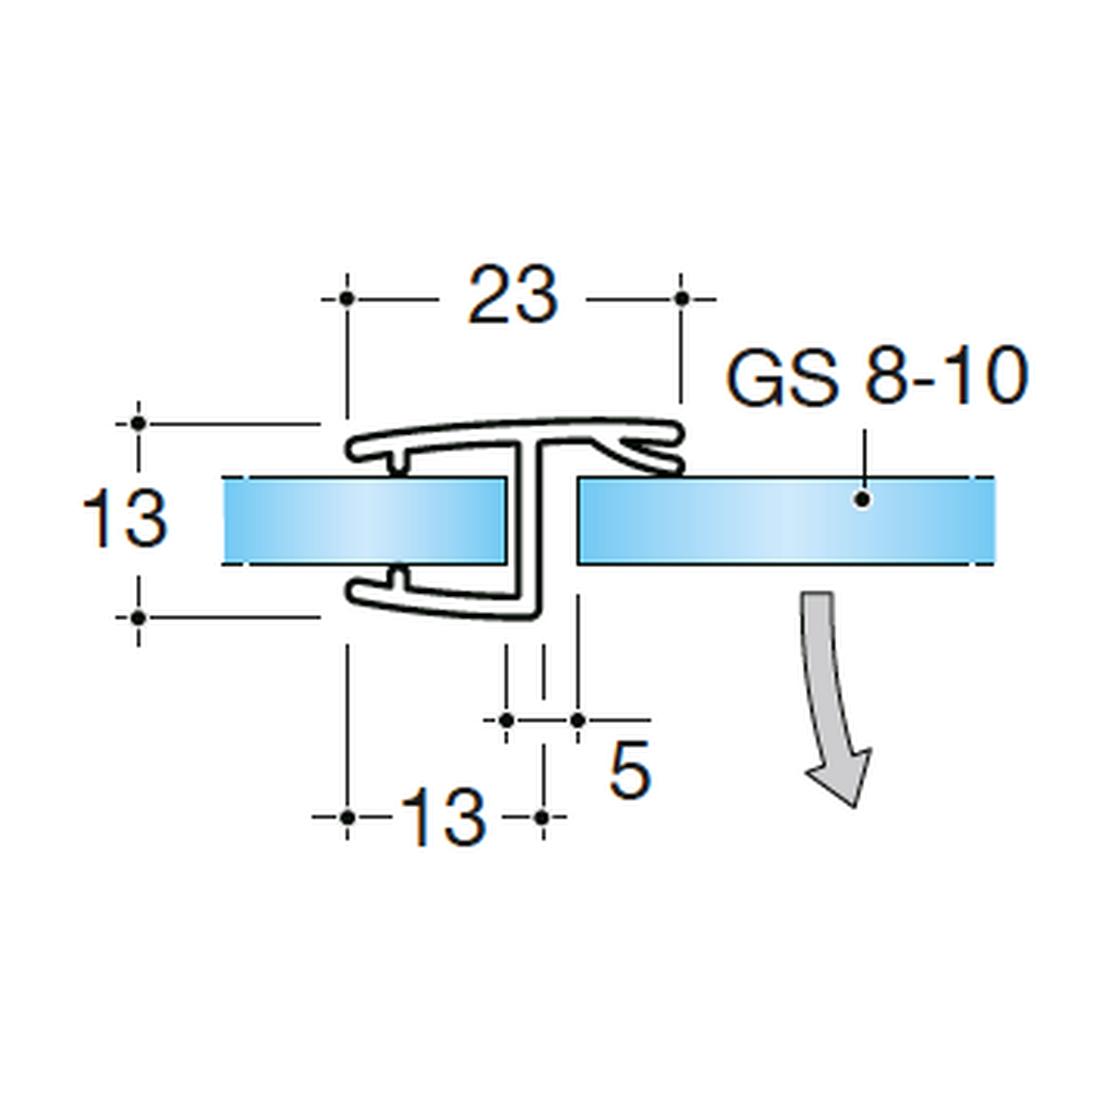 GLASTÜRDICHTUNG 180° GLAS-GLAS, GLASSTÄRKE 8-10MM